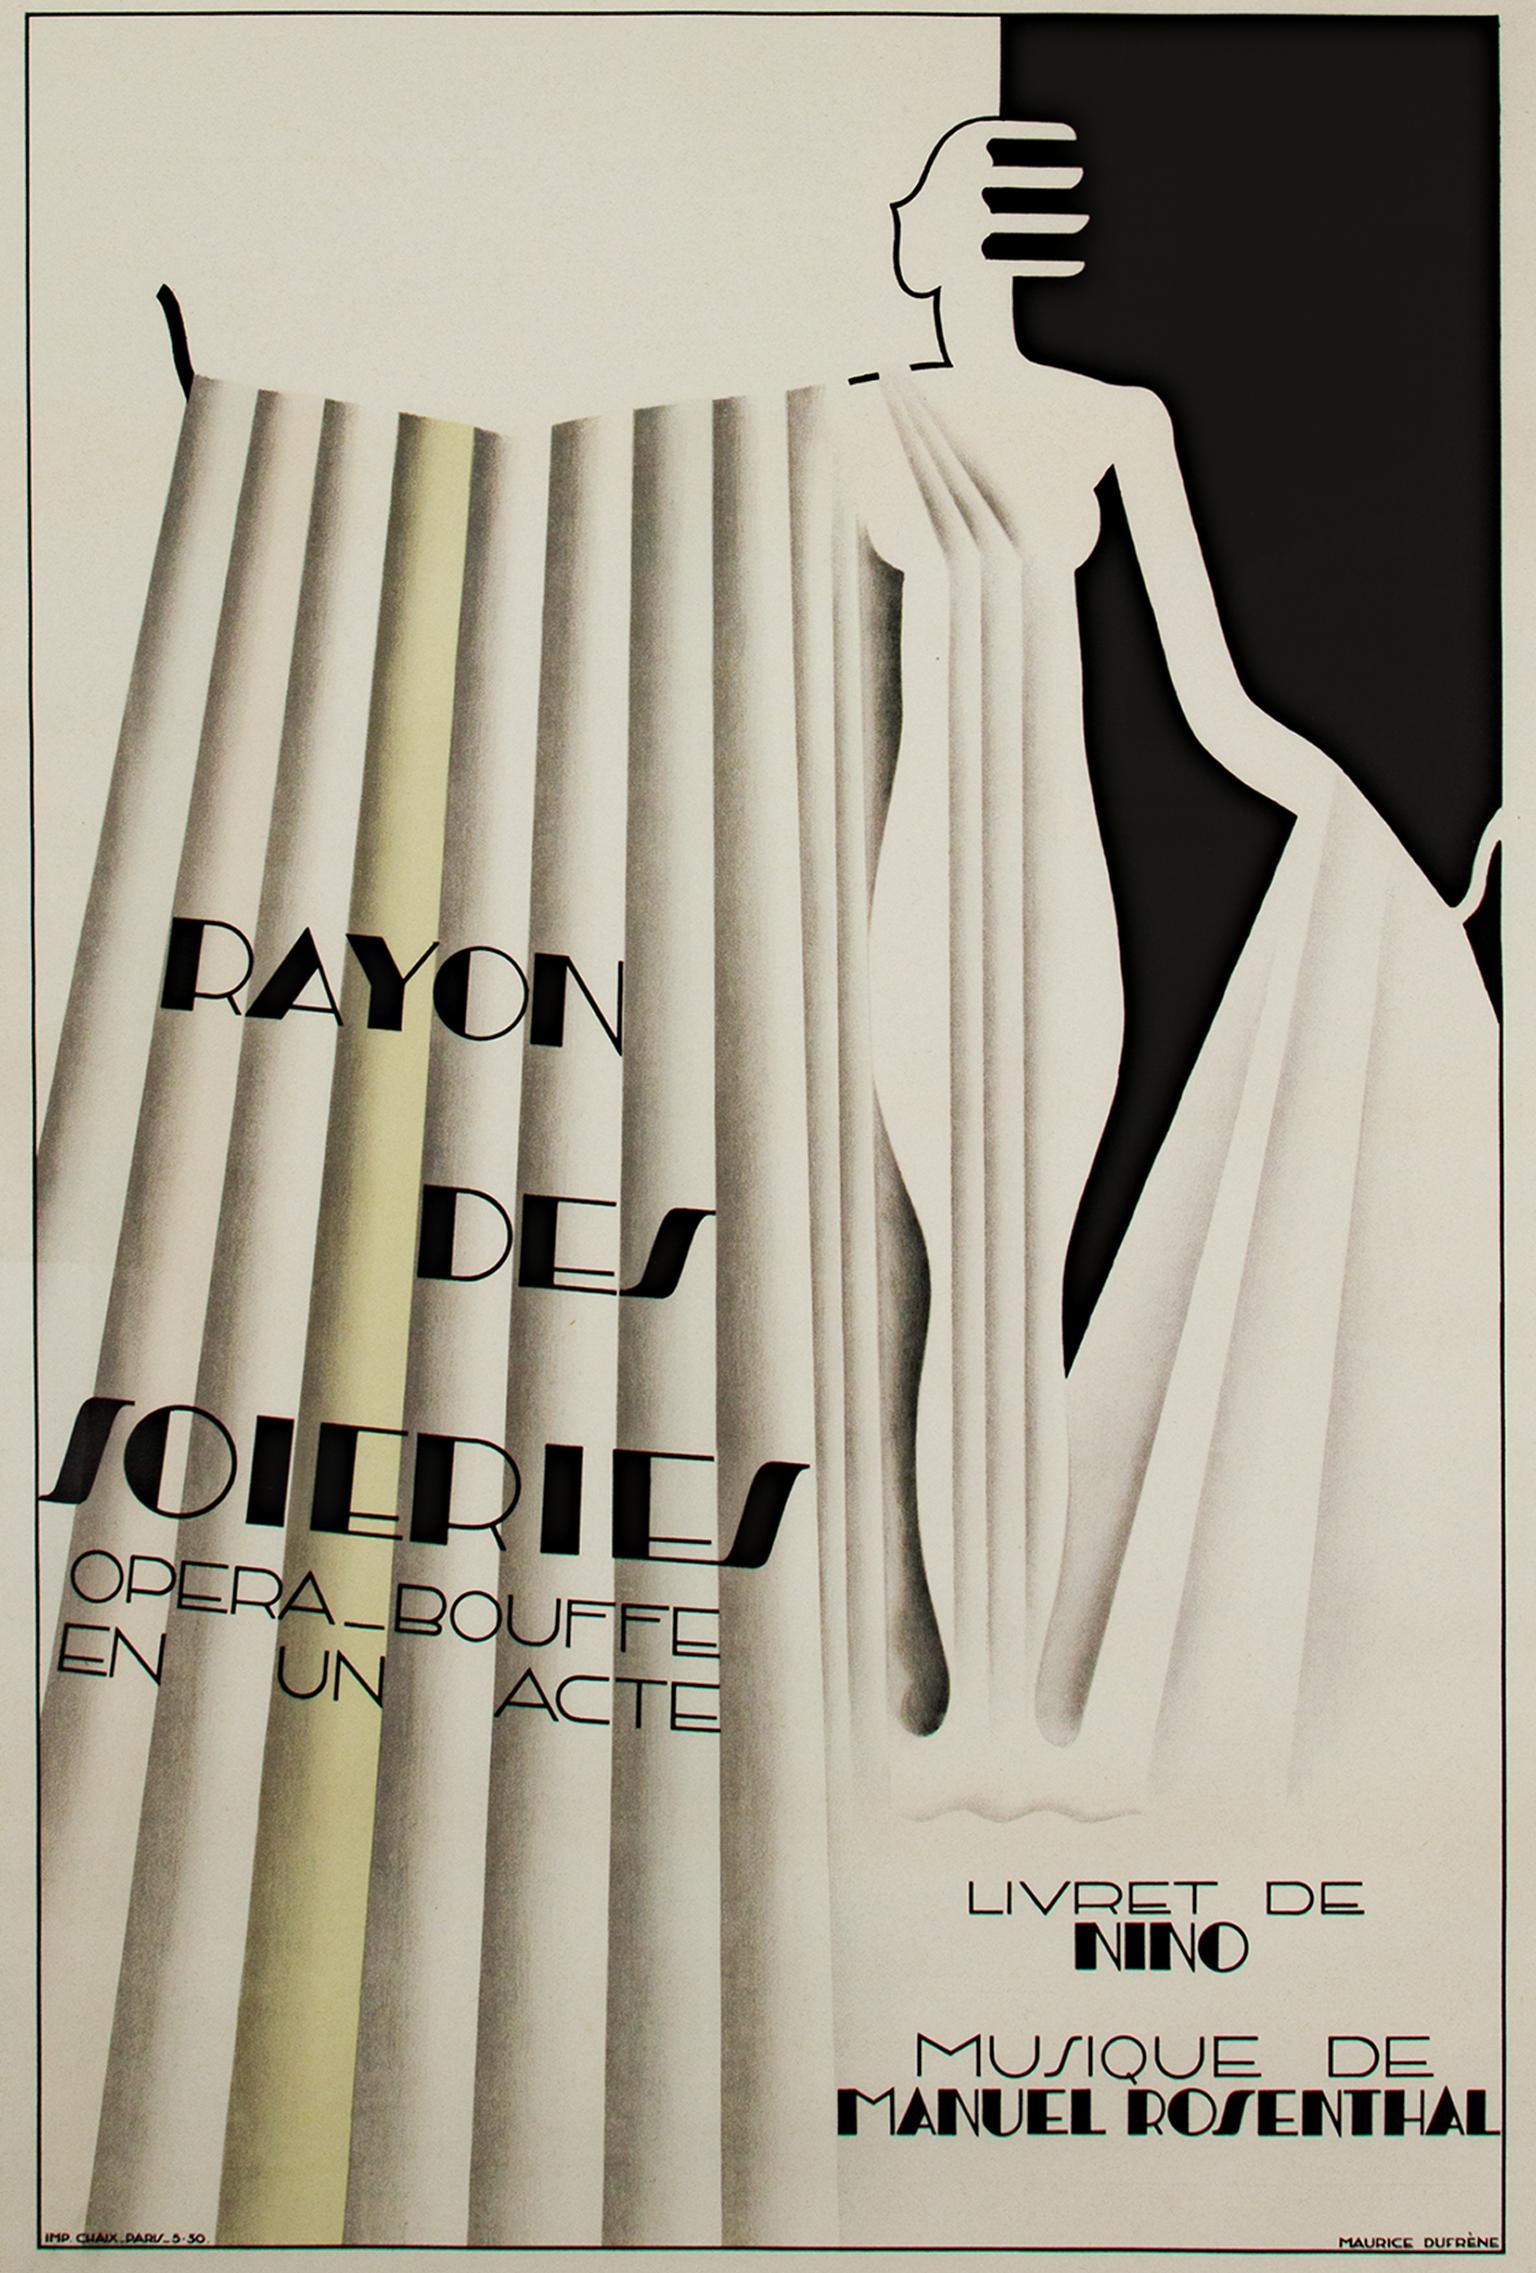 """Rayon des Soieries, Opera Bouffe en un Acte,"" Litho Poster by Maurice Dufrene"